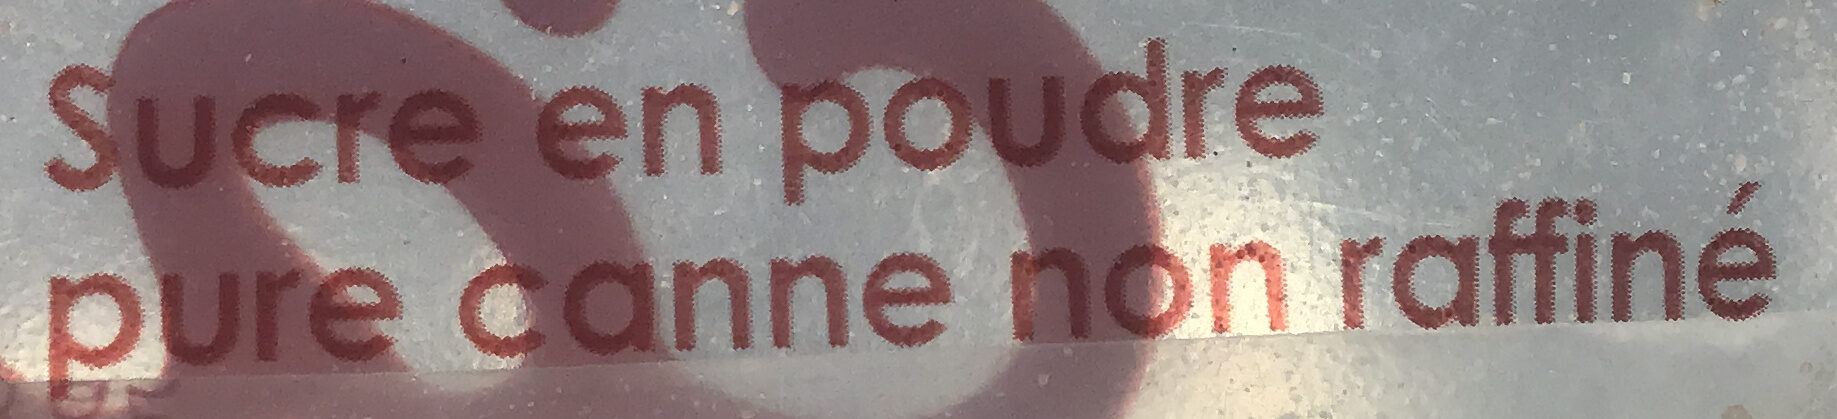 Cassonade pure canne - Ingrédients - fr